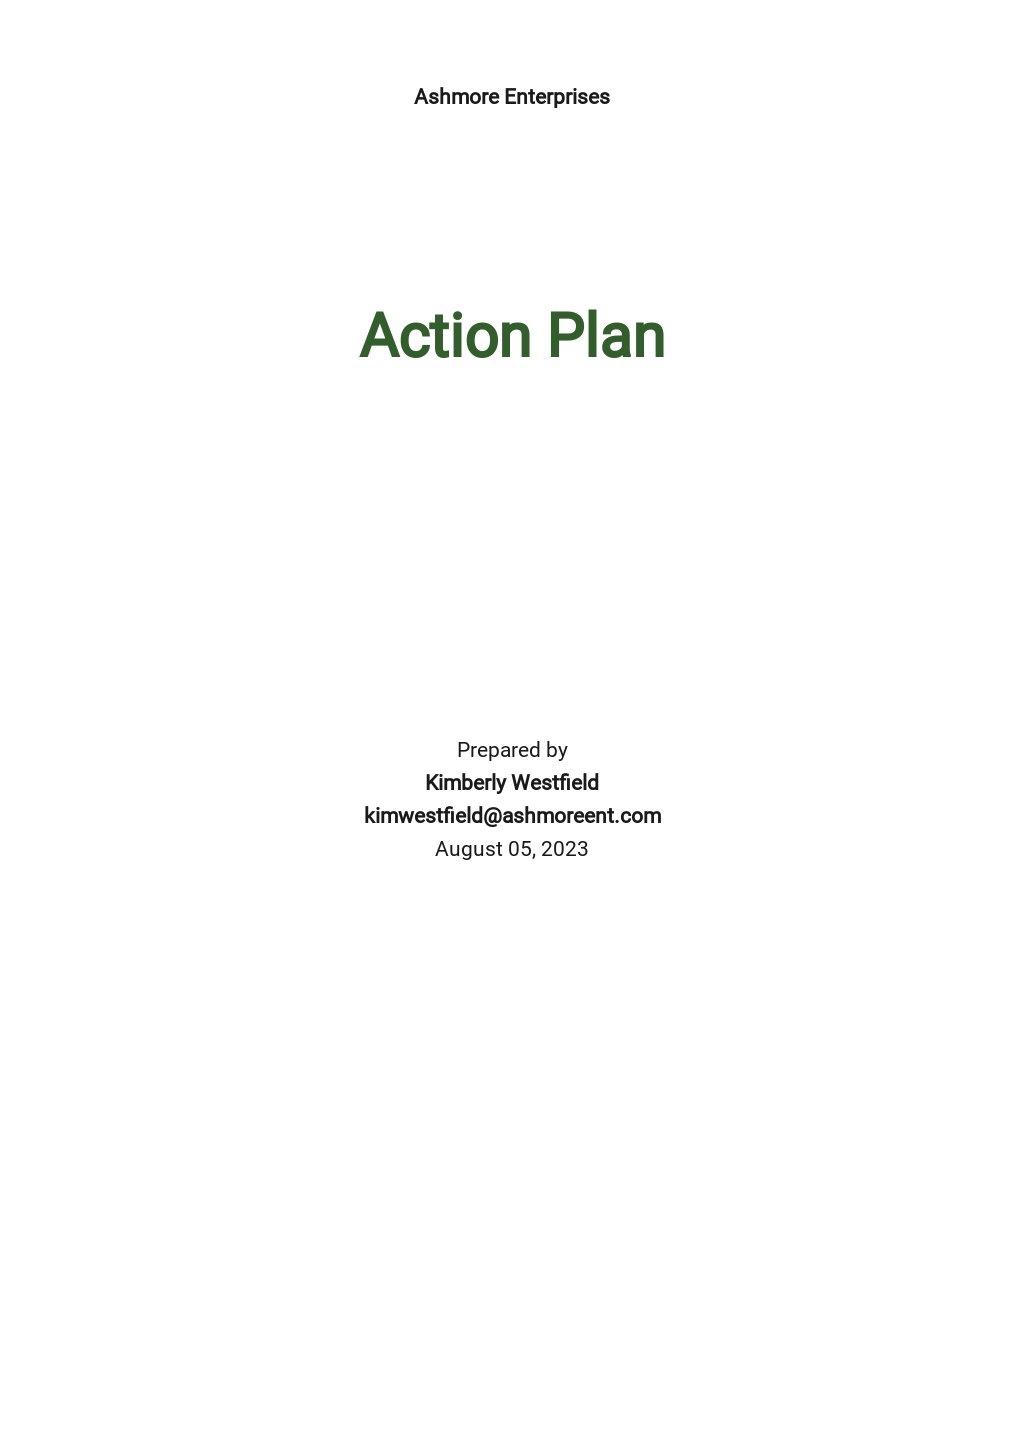 Recruitment Action Plan Template [Free PDF] - Google Docs, Word, PDF